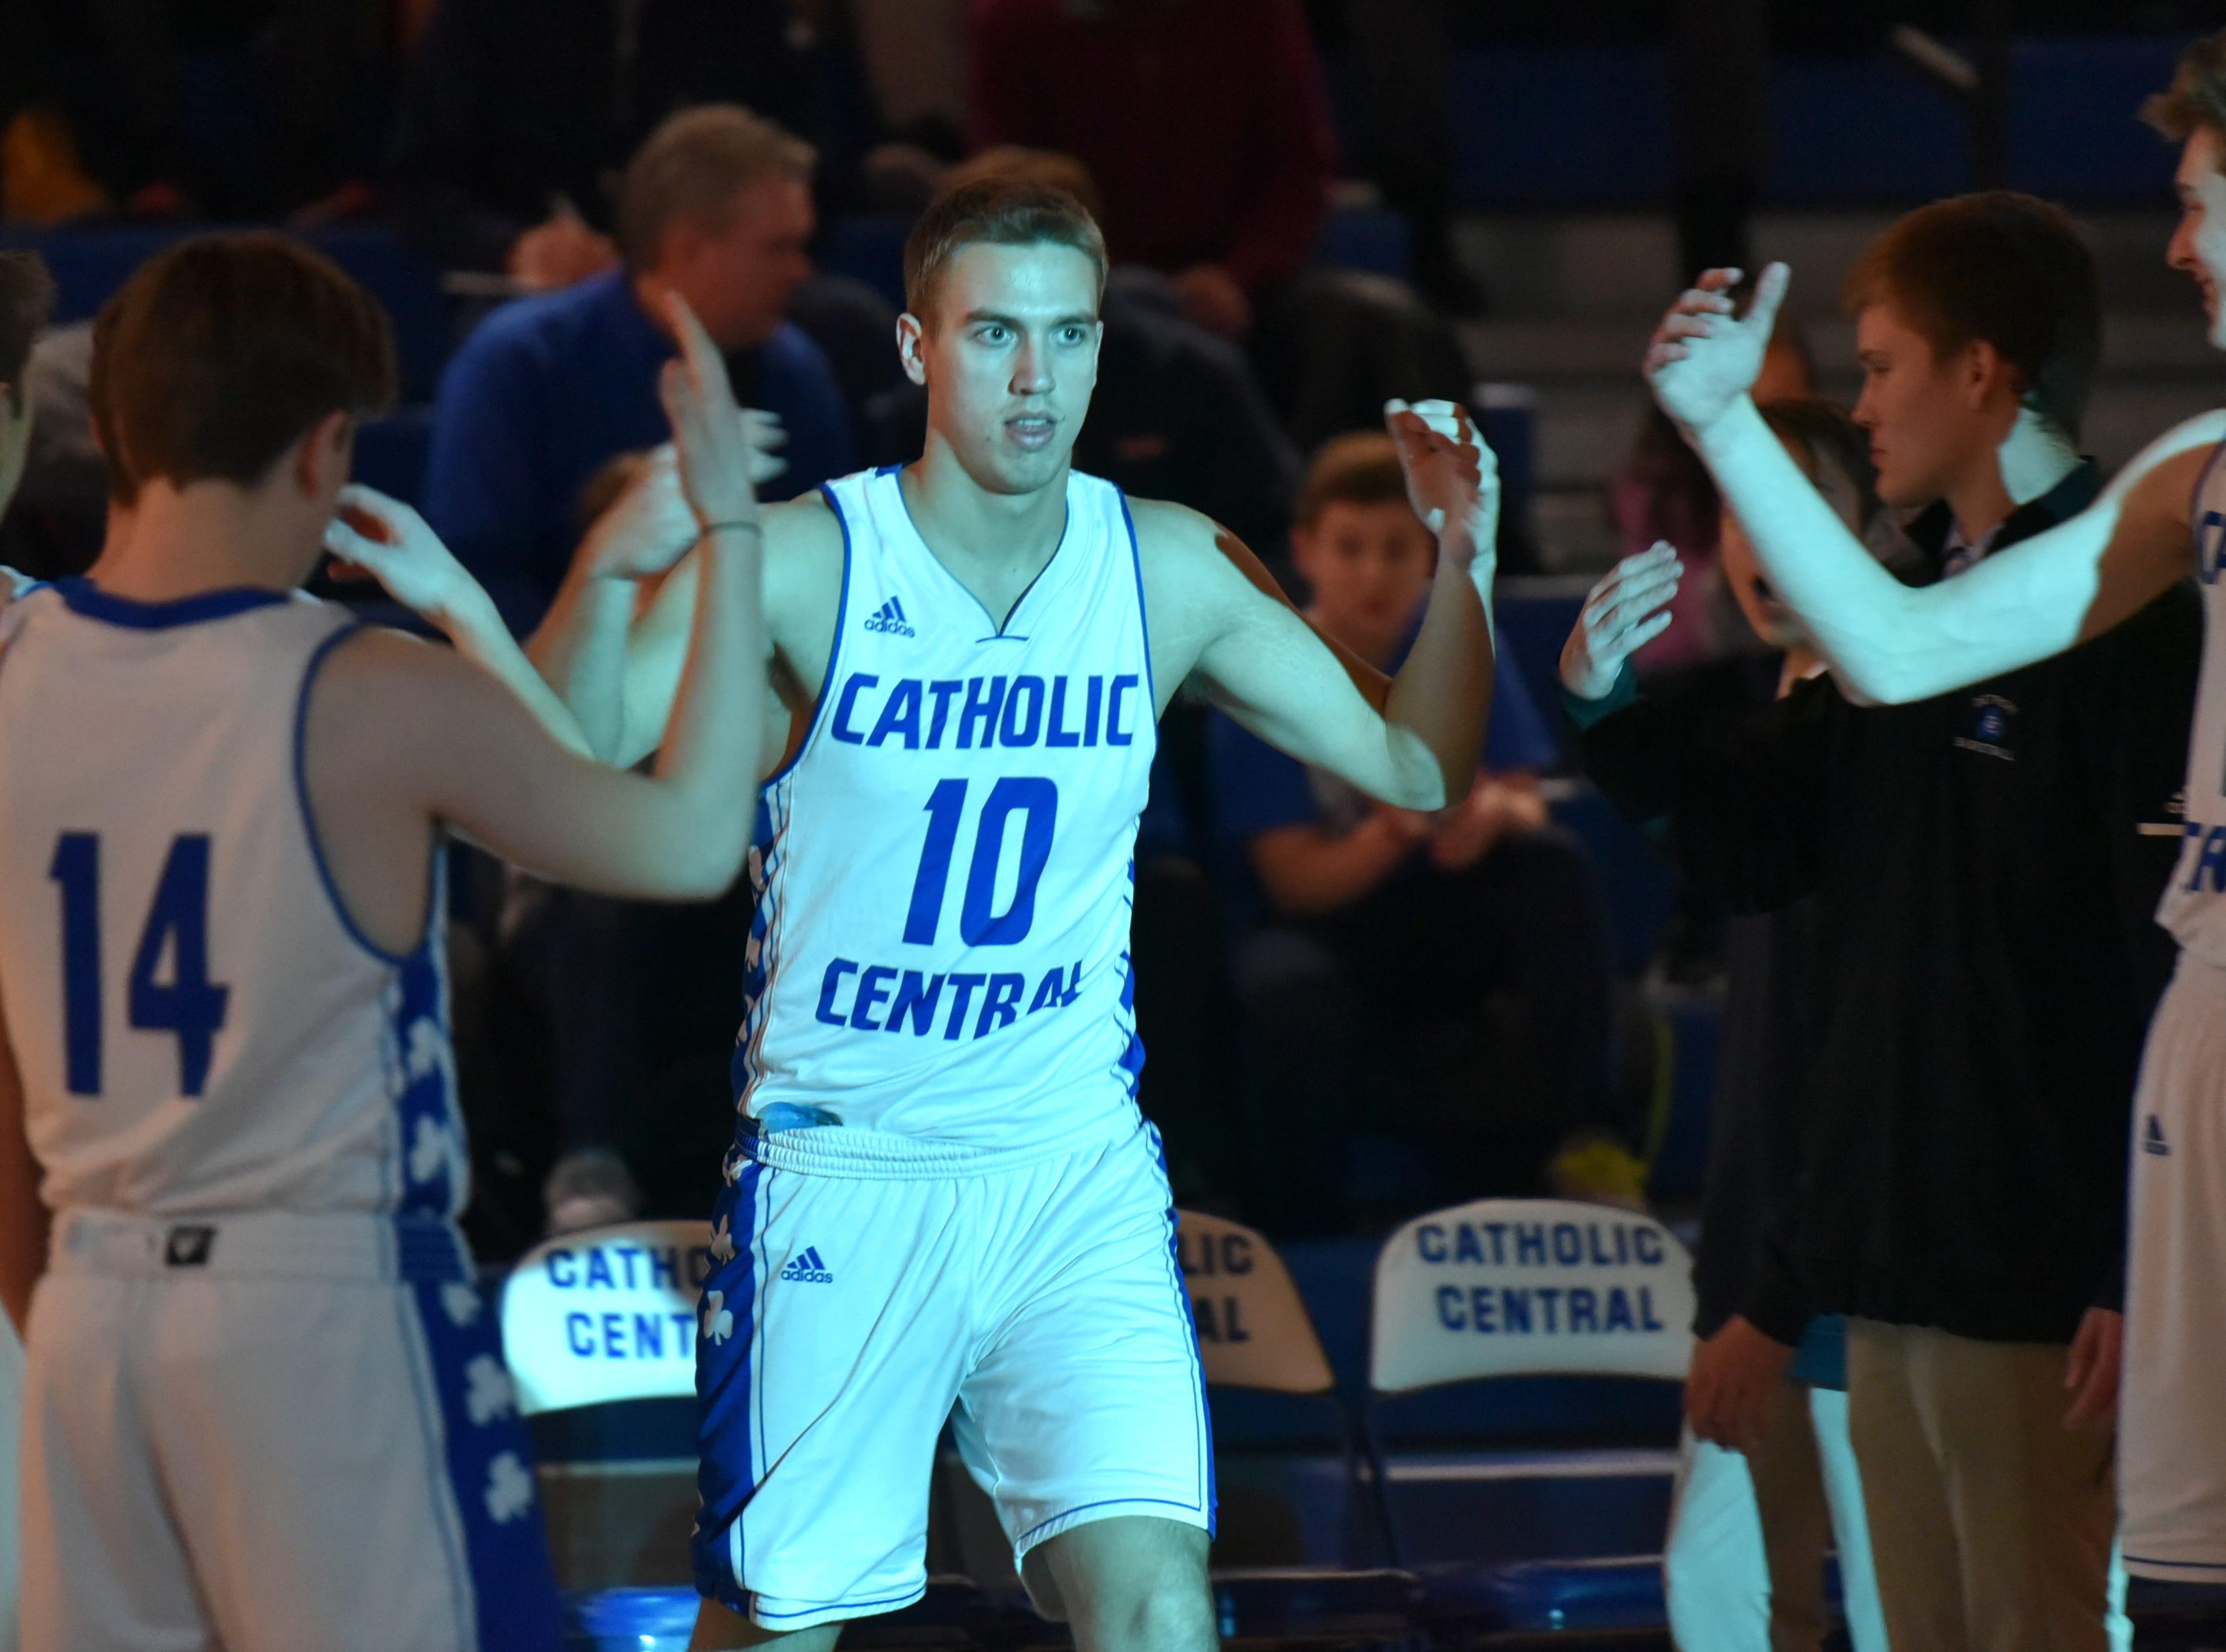 Shamrock Mike Harding is introduced to the Catholic Central gymnasium.